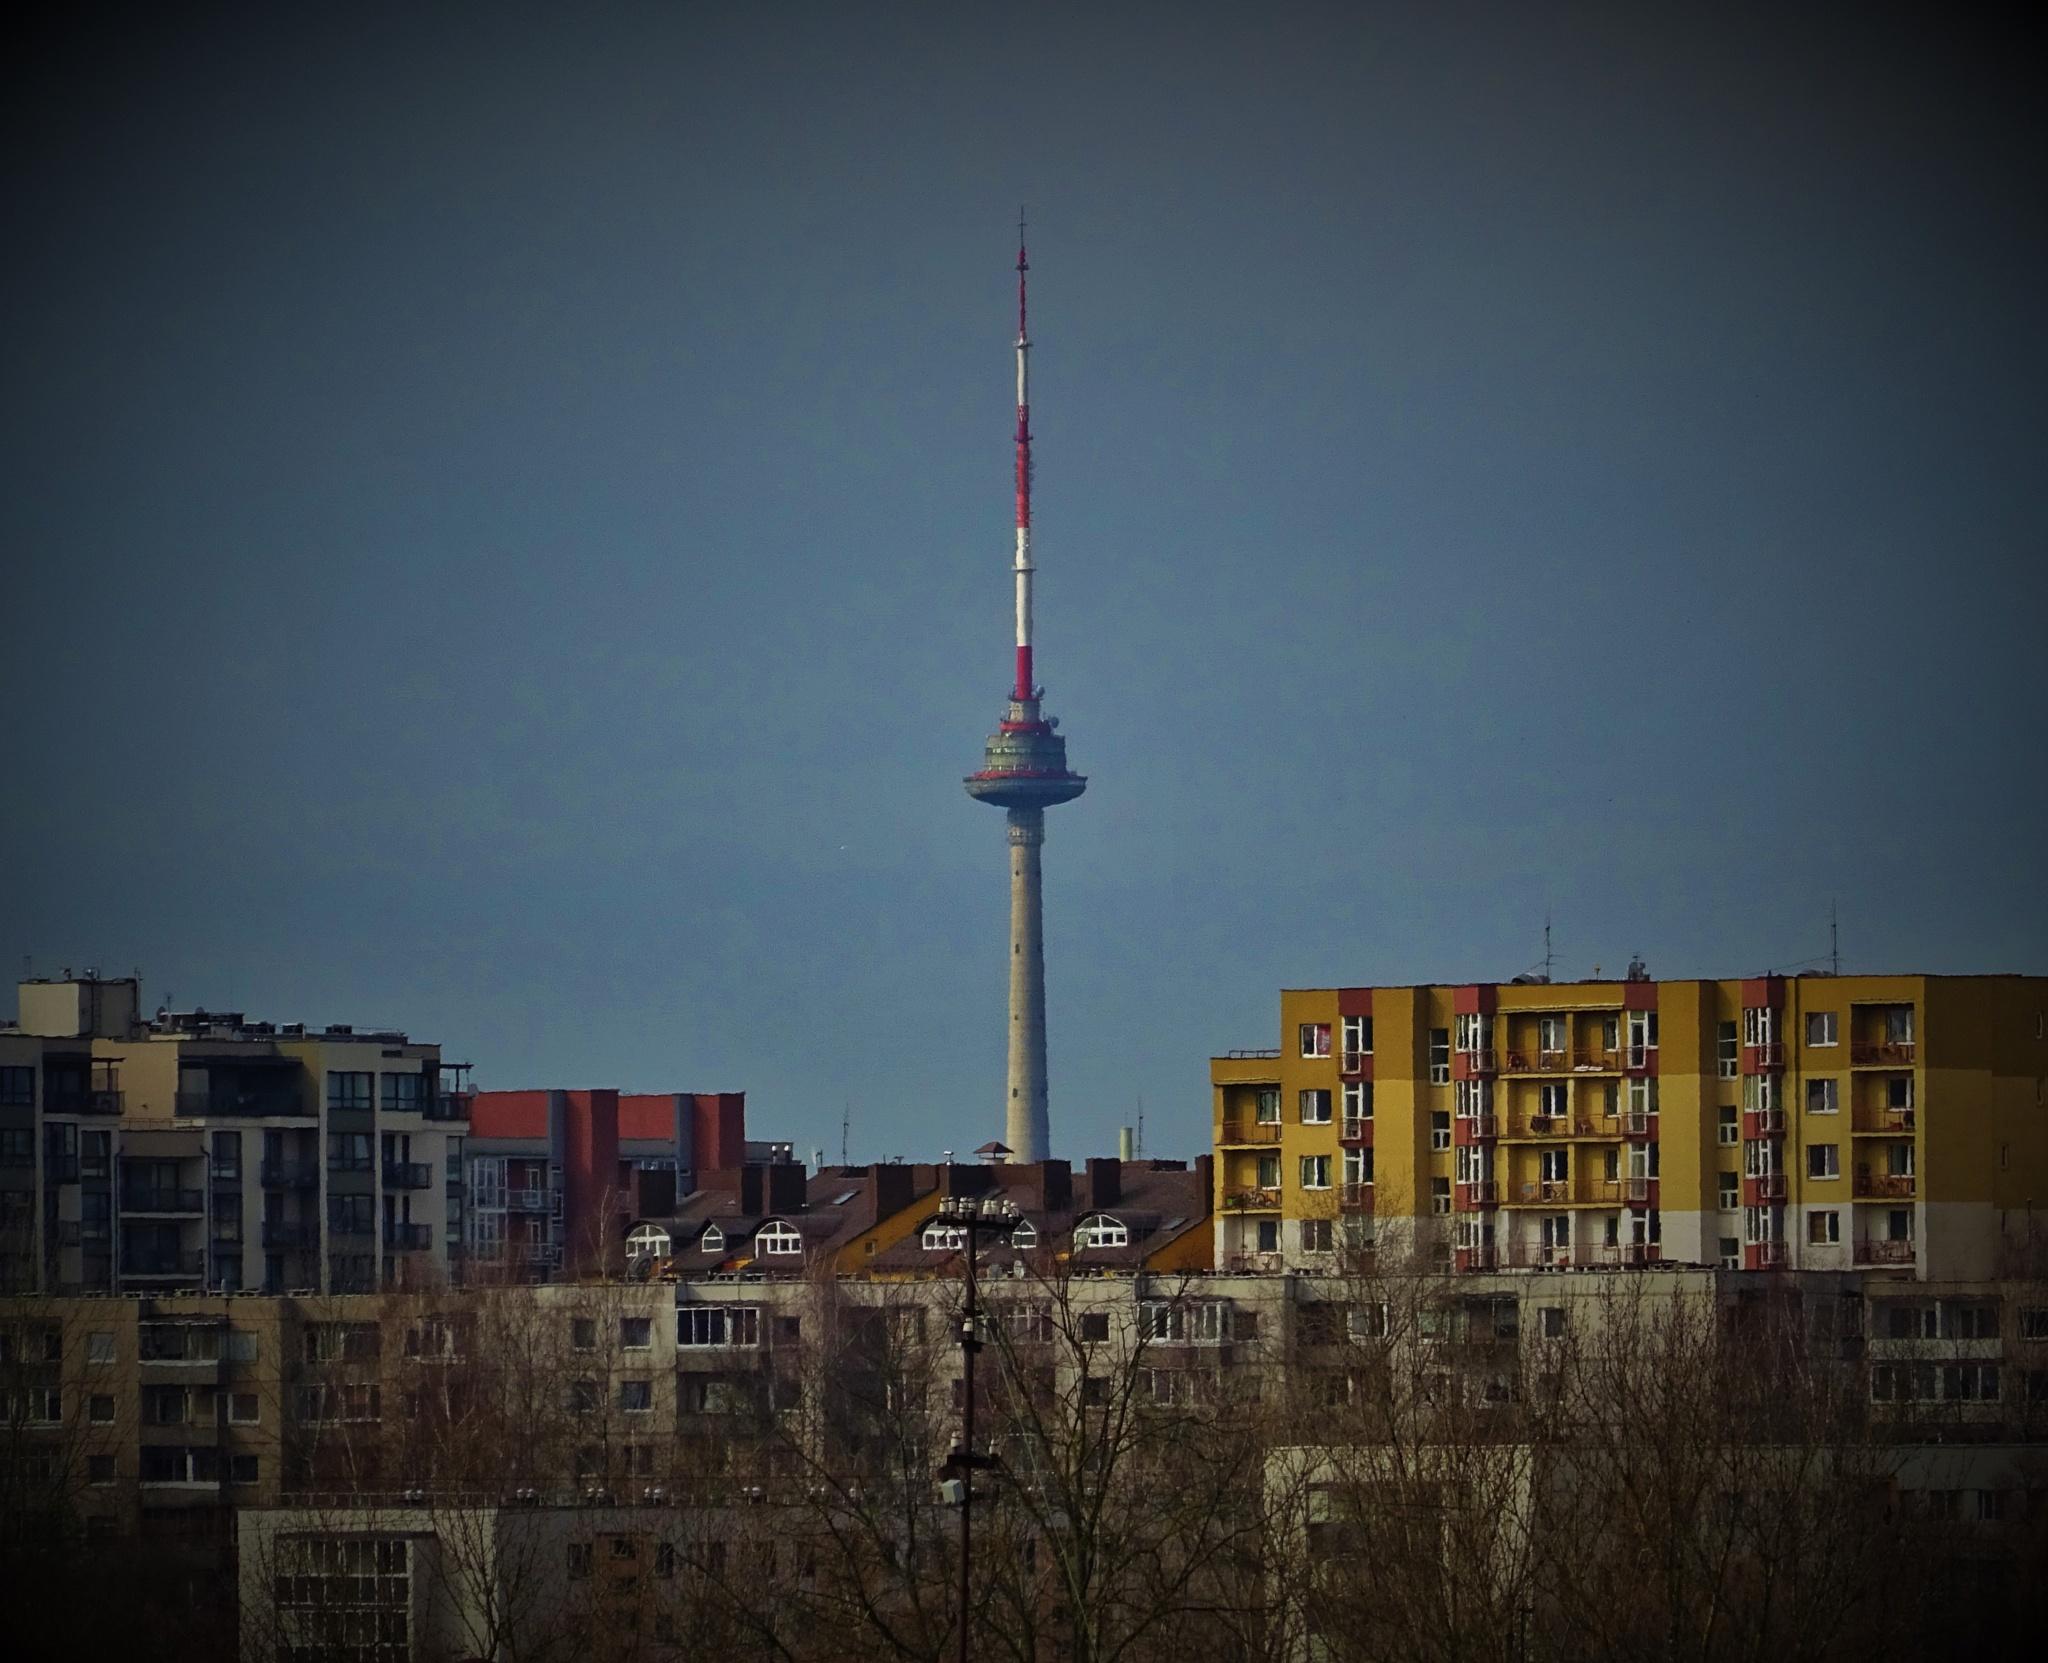 A TV tower in Vilnius. by vita.tucaite